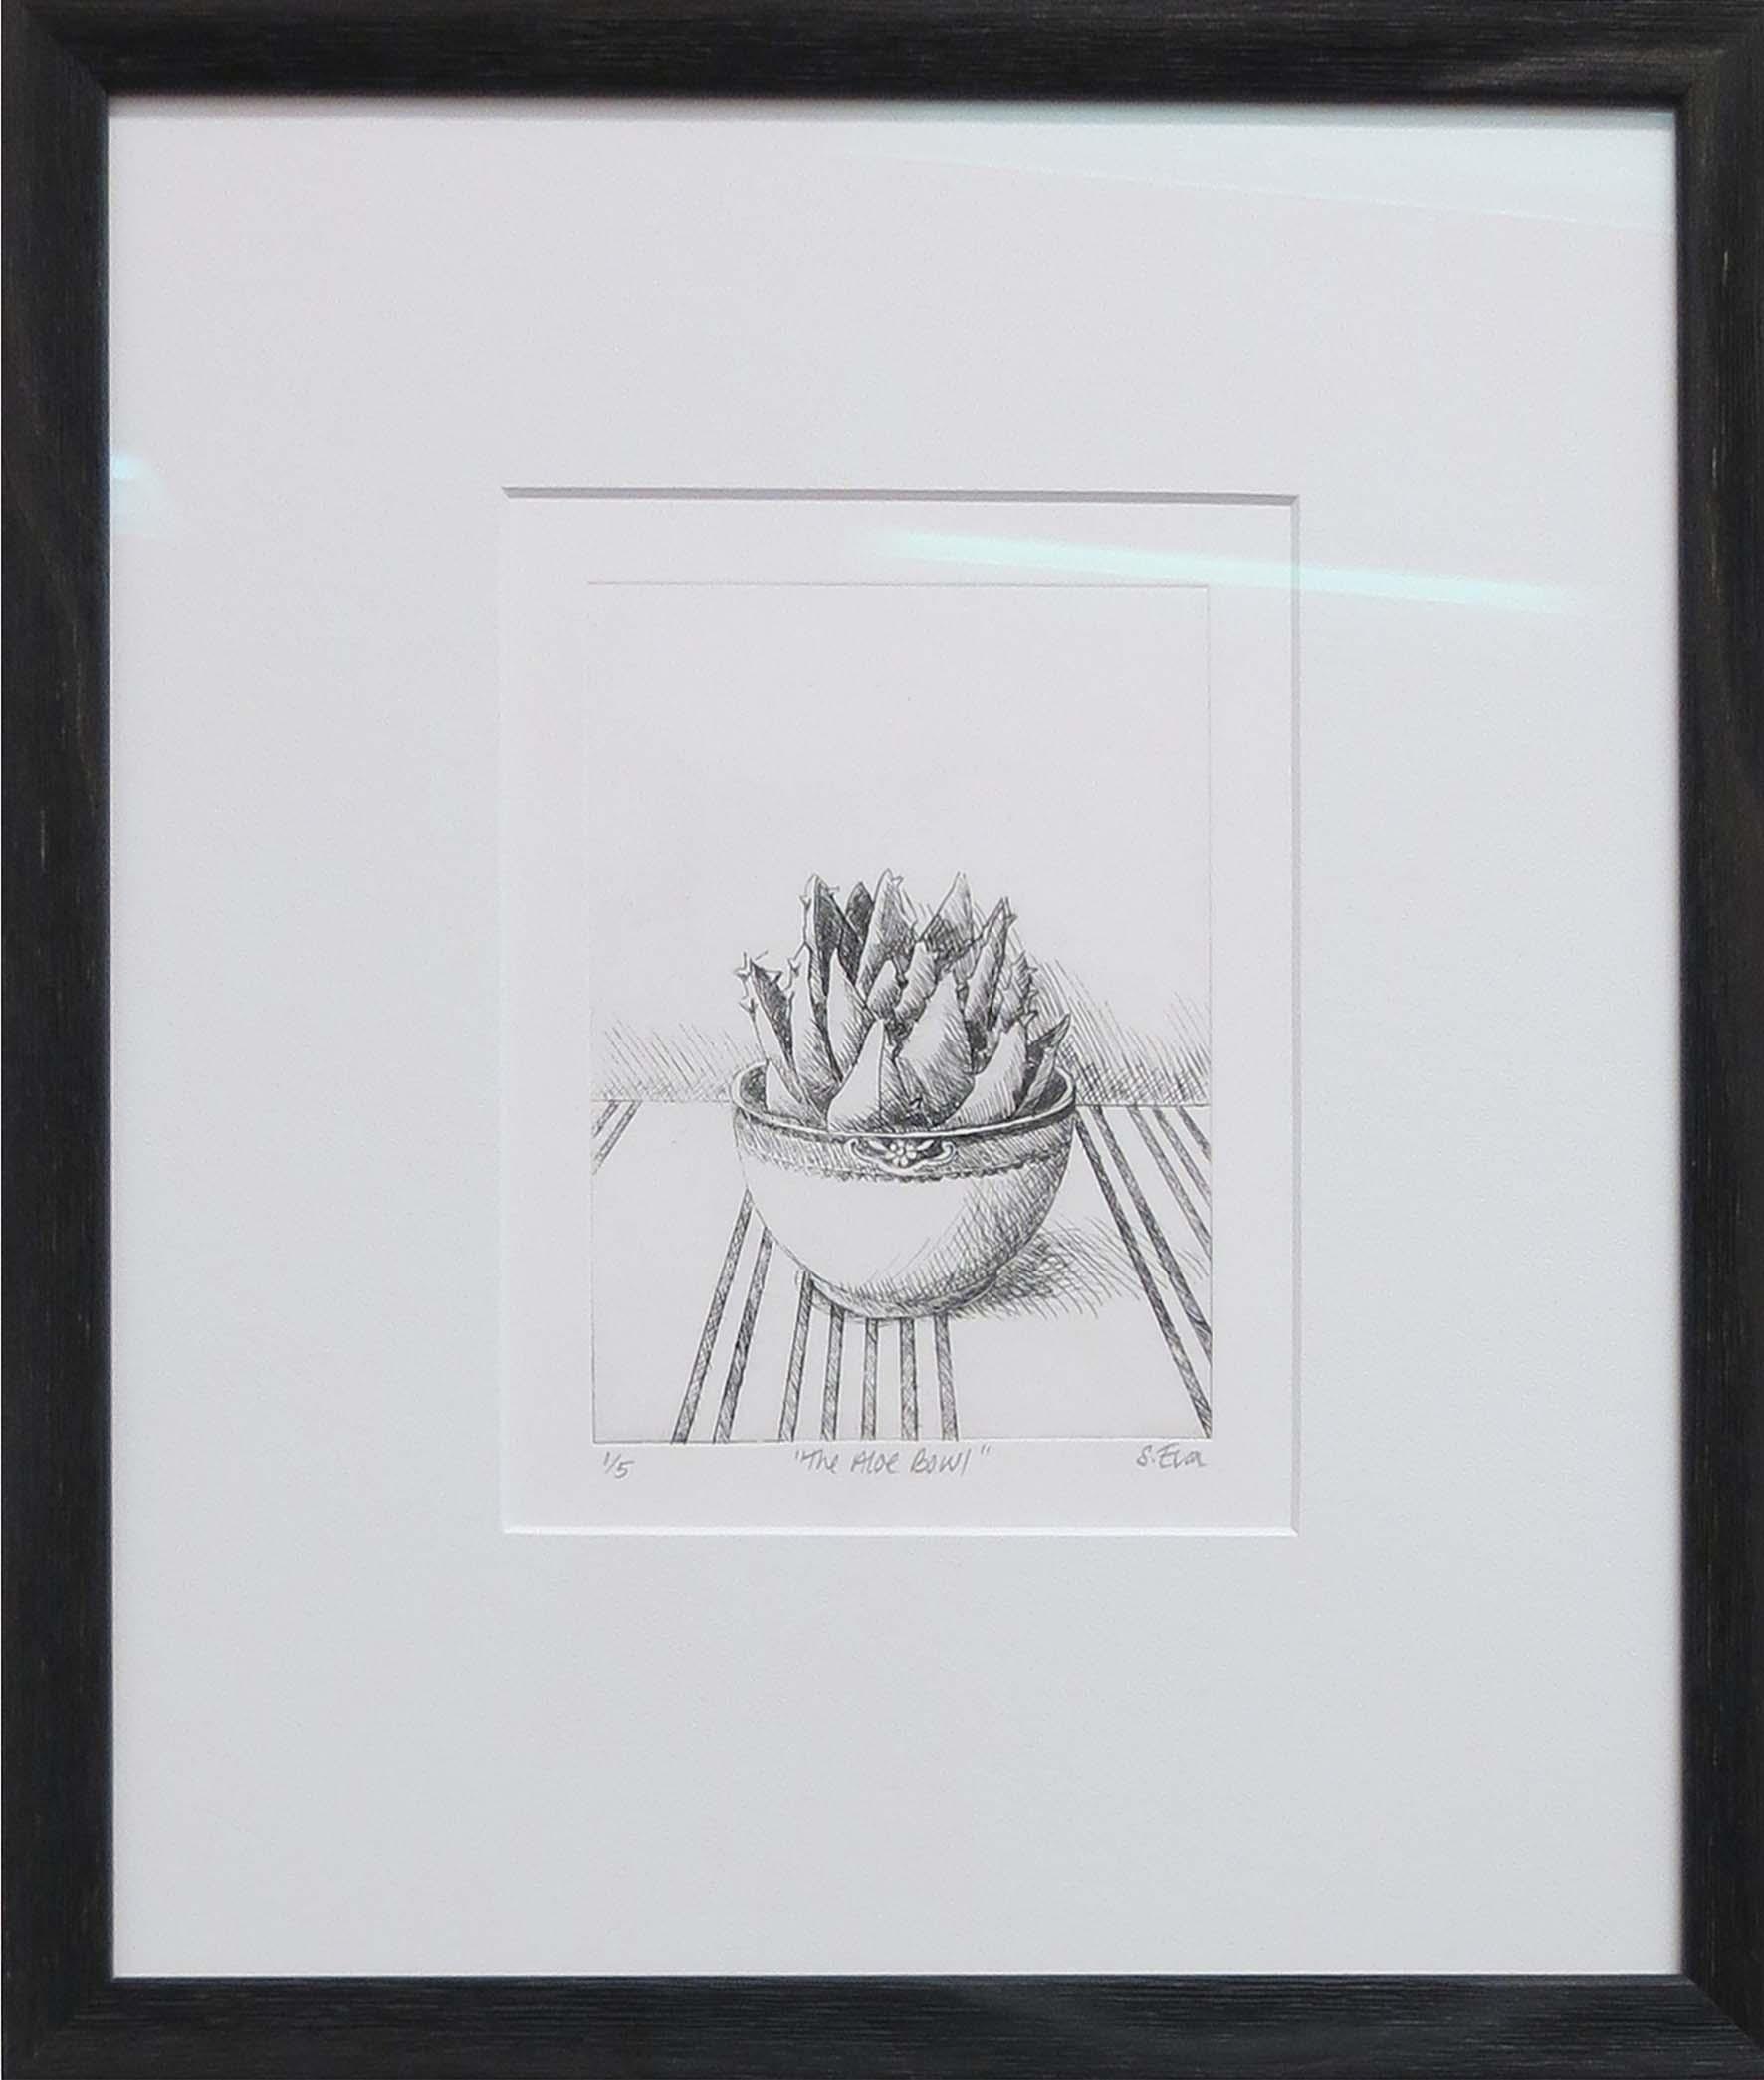 1. Sue Eva, 'The Aloe Bowl', 2018, Drypoint etching, 15.5 x 11.5cm, $195